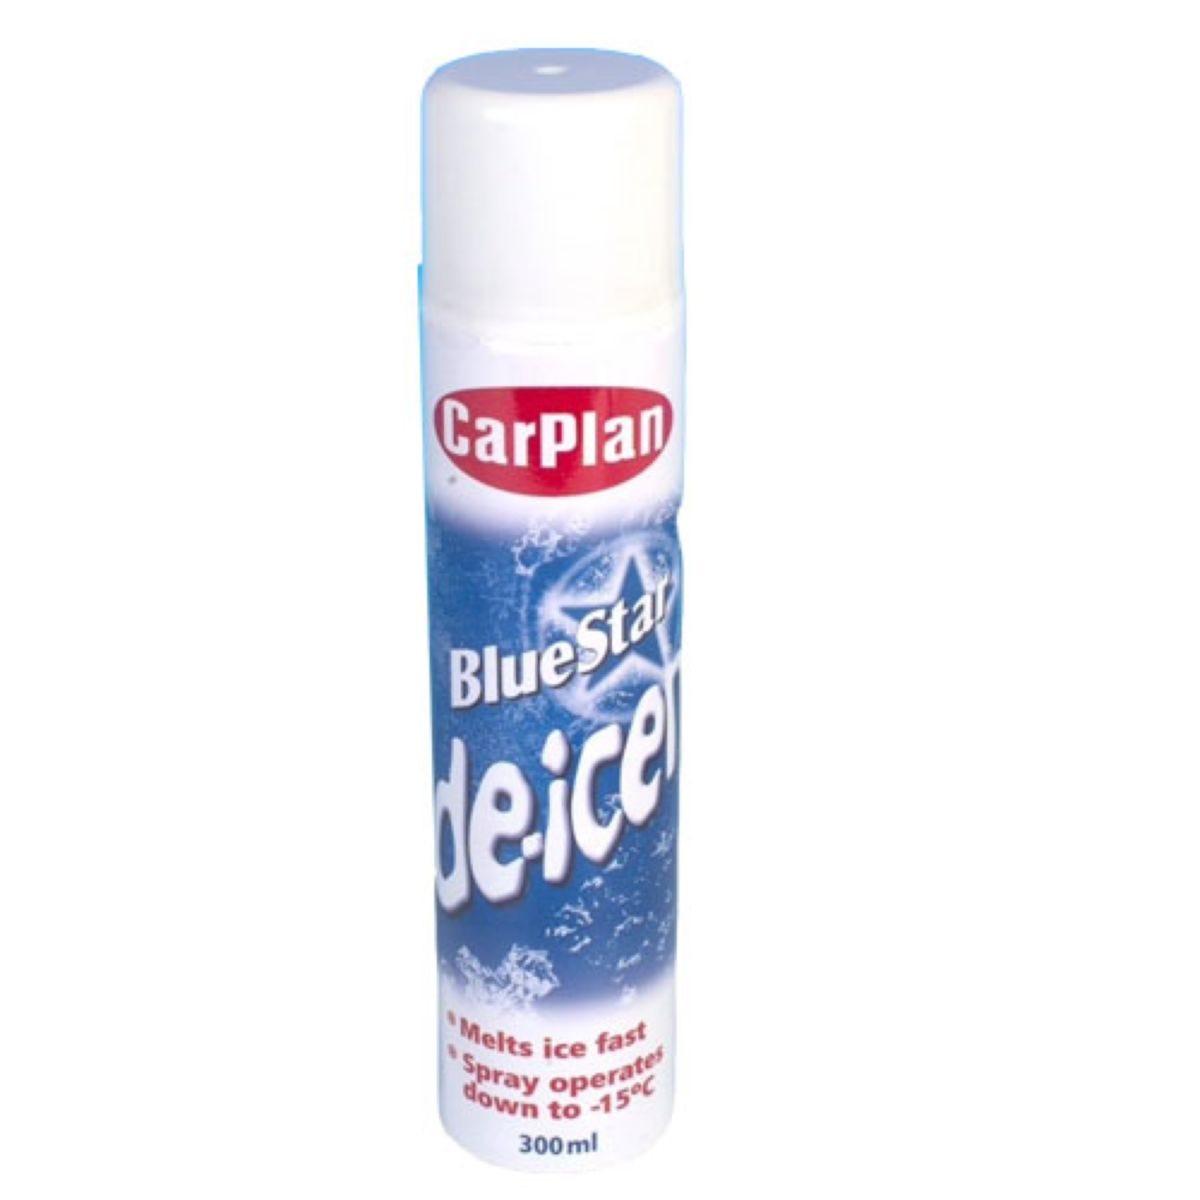 CarPlan De-Icer - 300ml